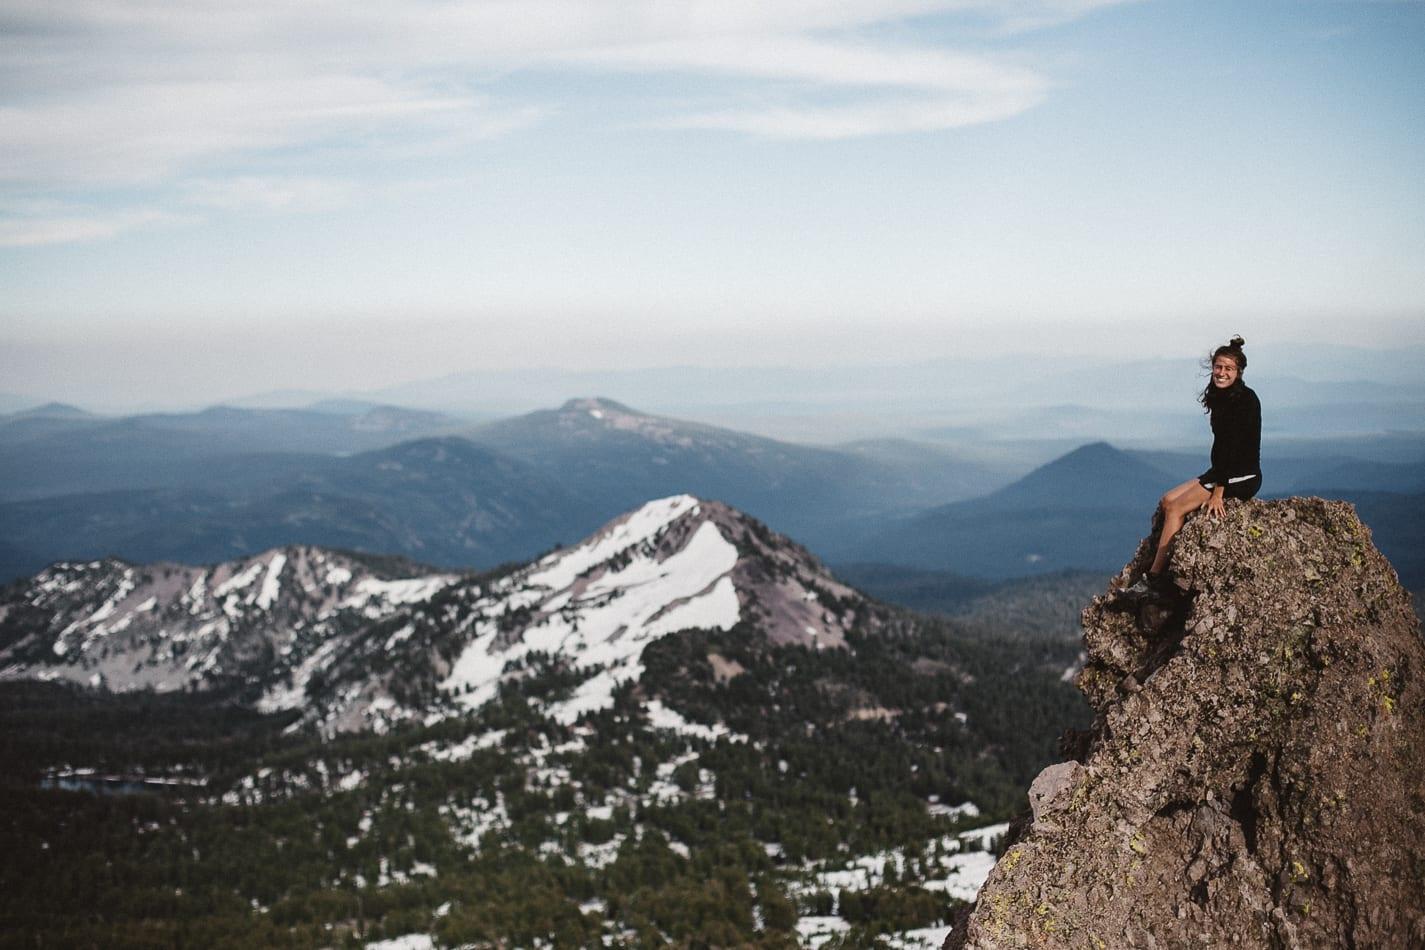 mount-lassen-california-adventure-lifestyle-photorapher-23